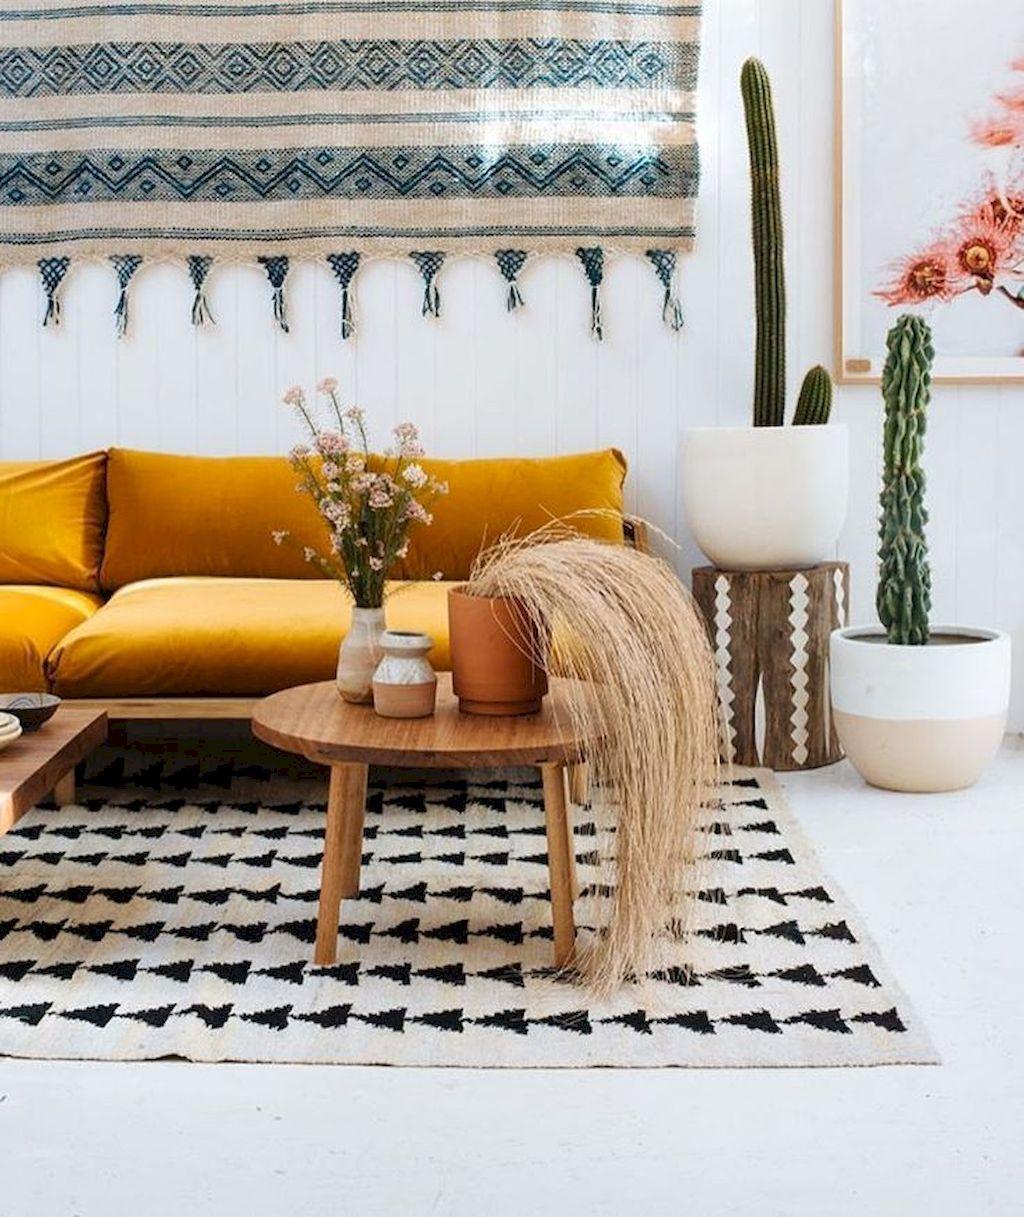 75 beautiful yellow sofa for living room decor ideas